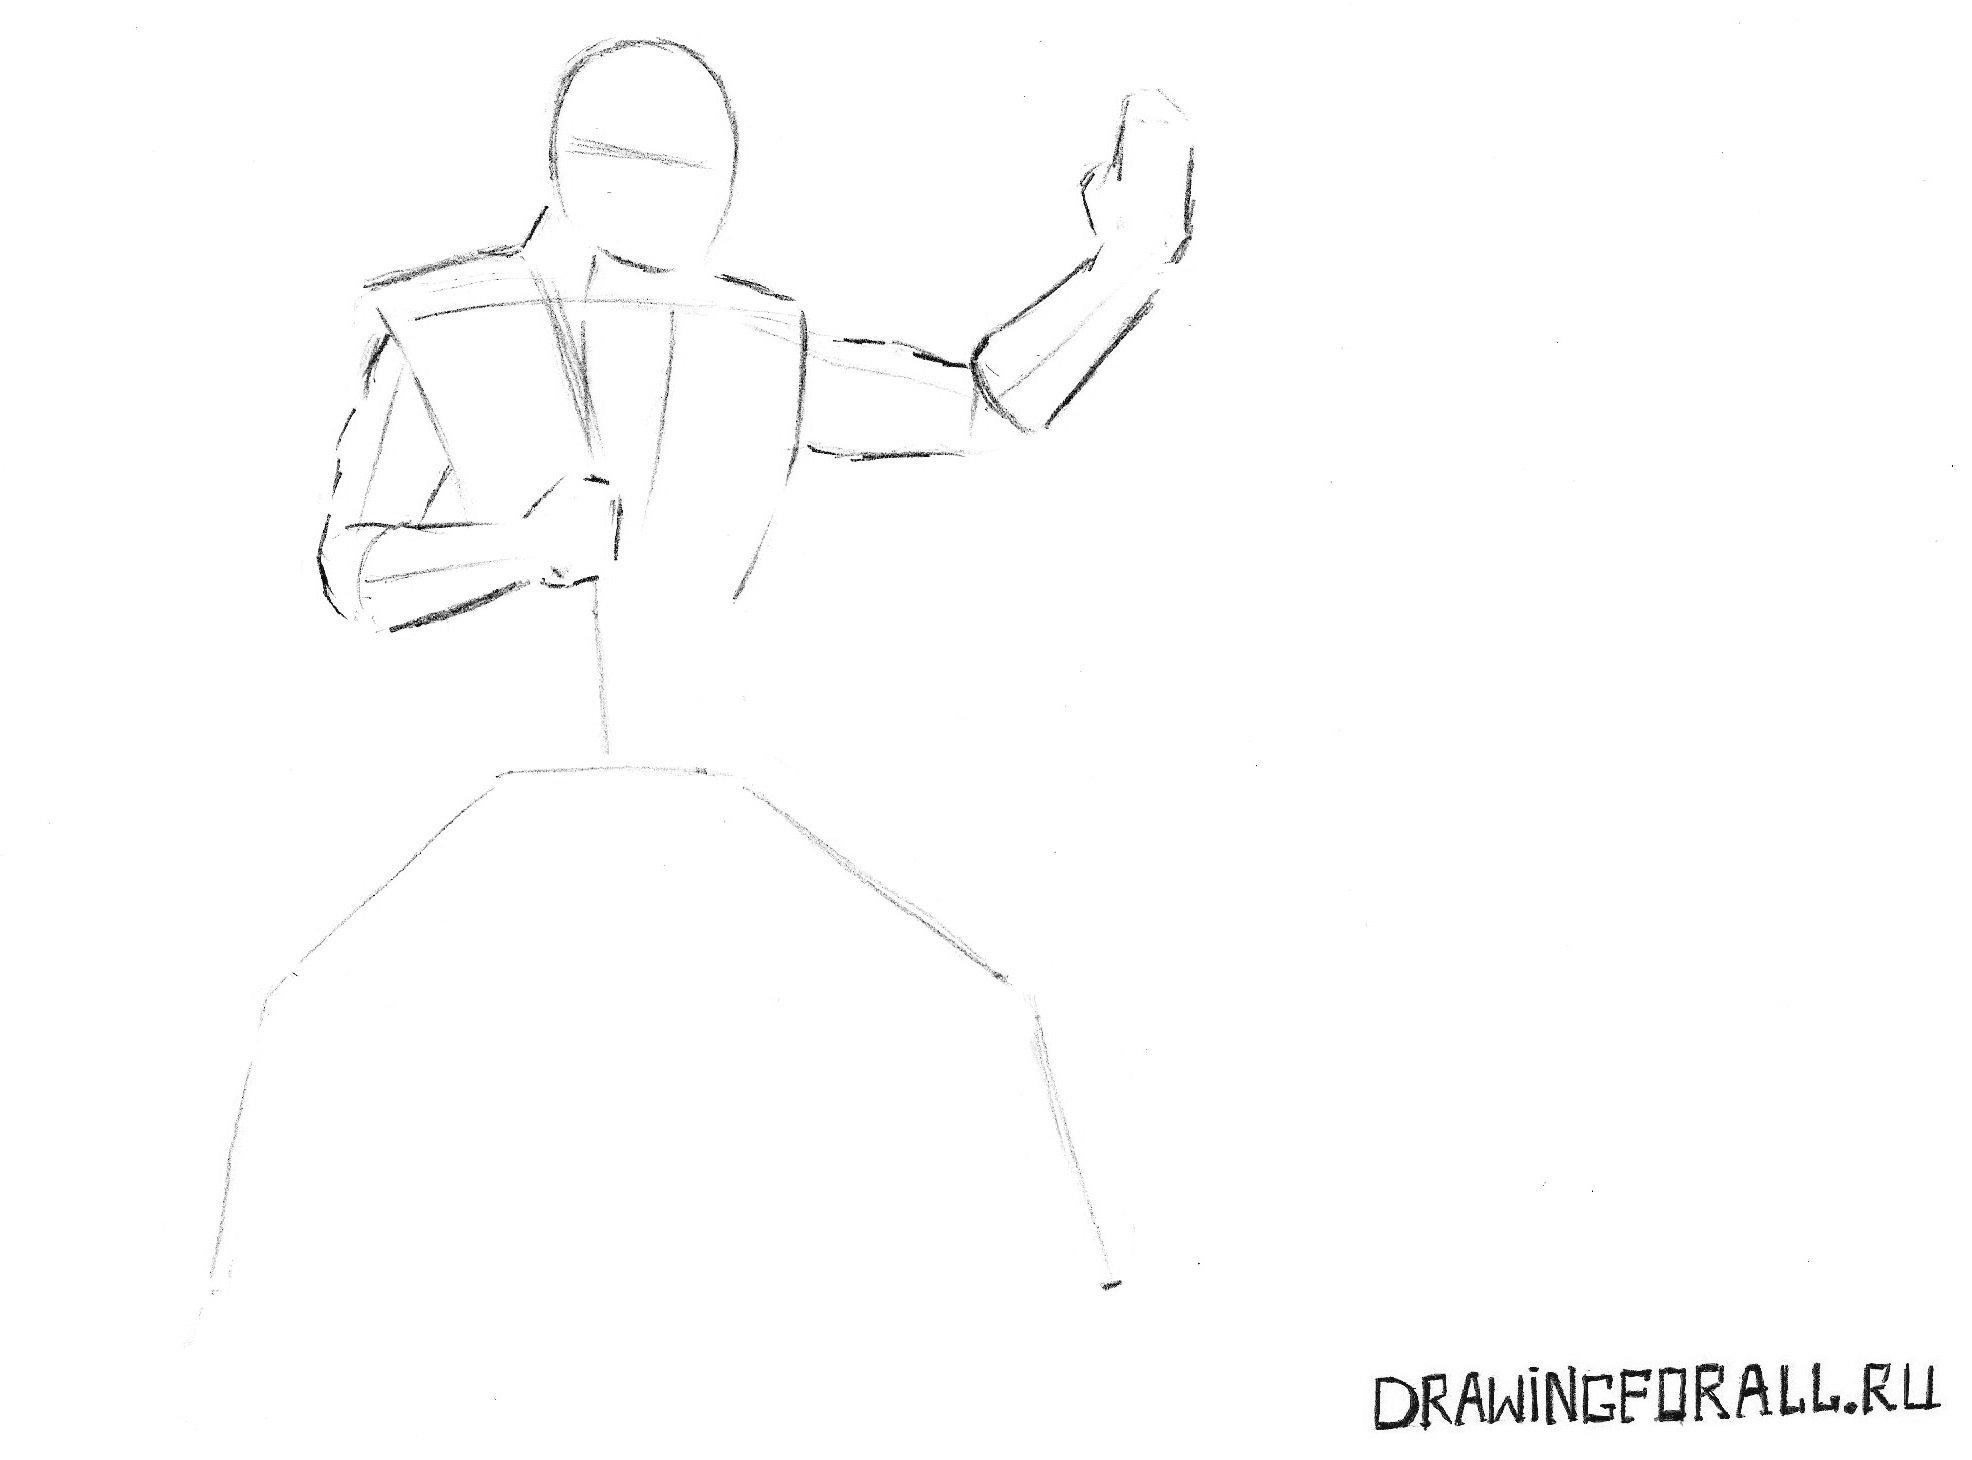 как нарисовать саб зиро